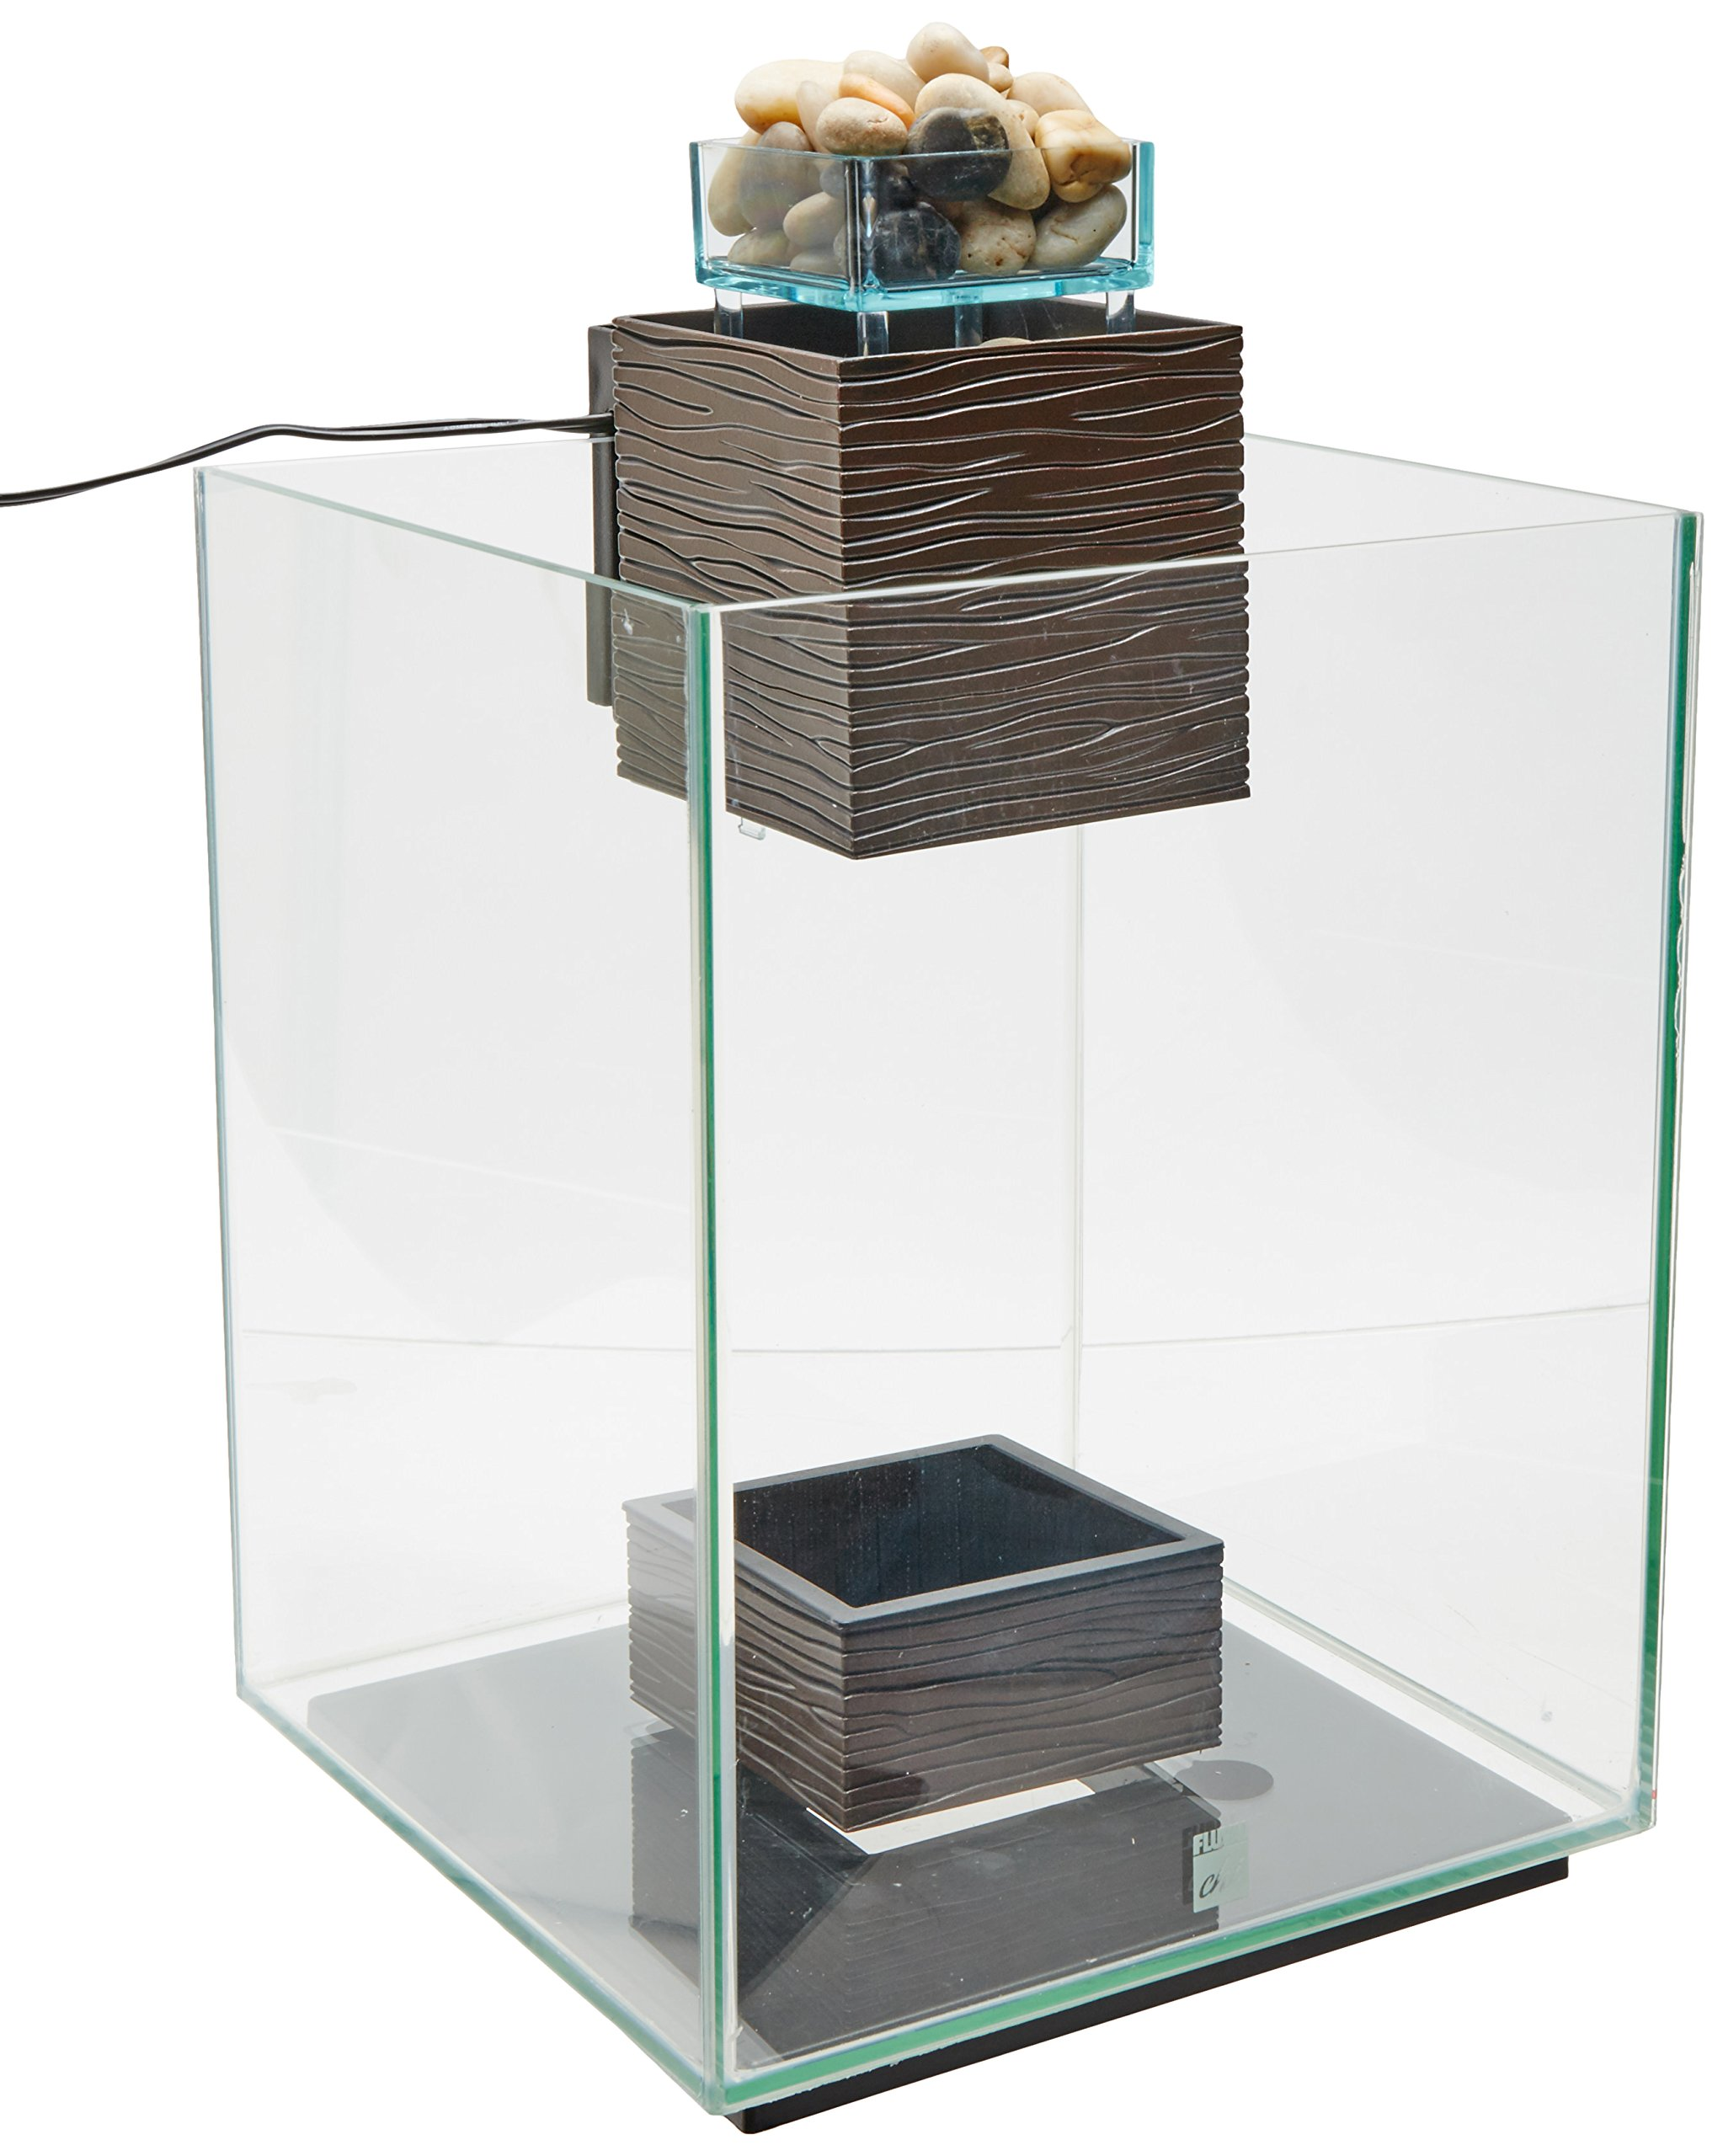 Fluval chi ii aquarium set 5 gallon ebay for Fluval chi fish tank